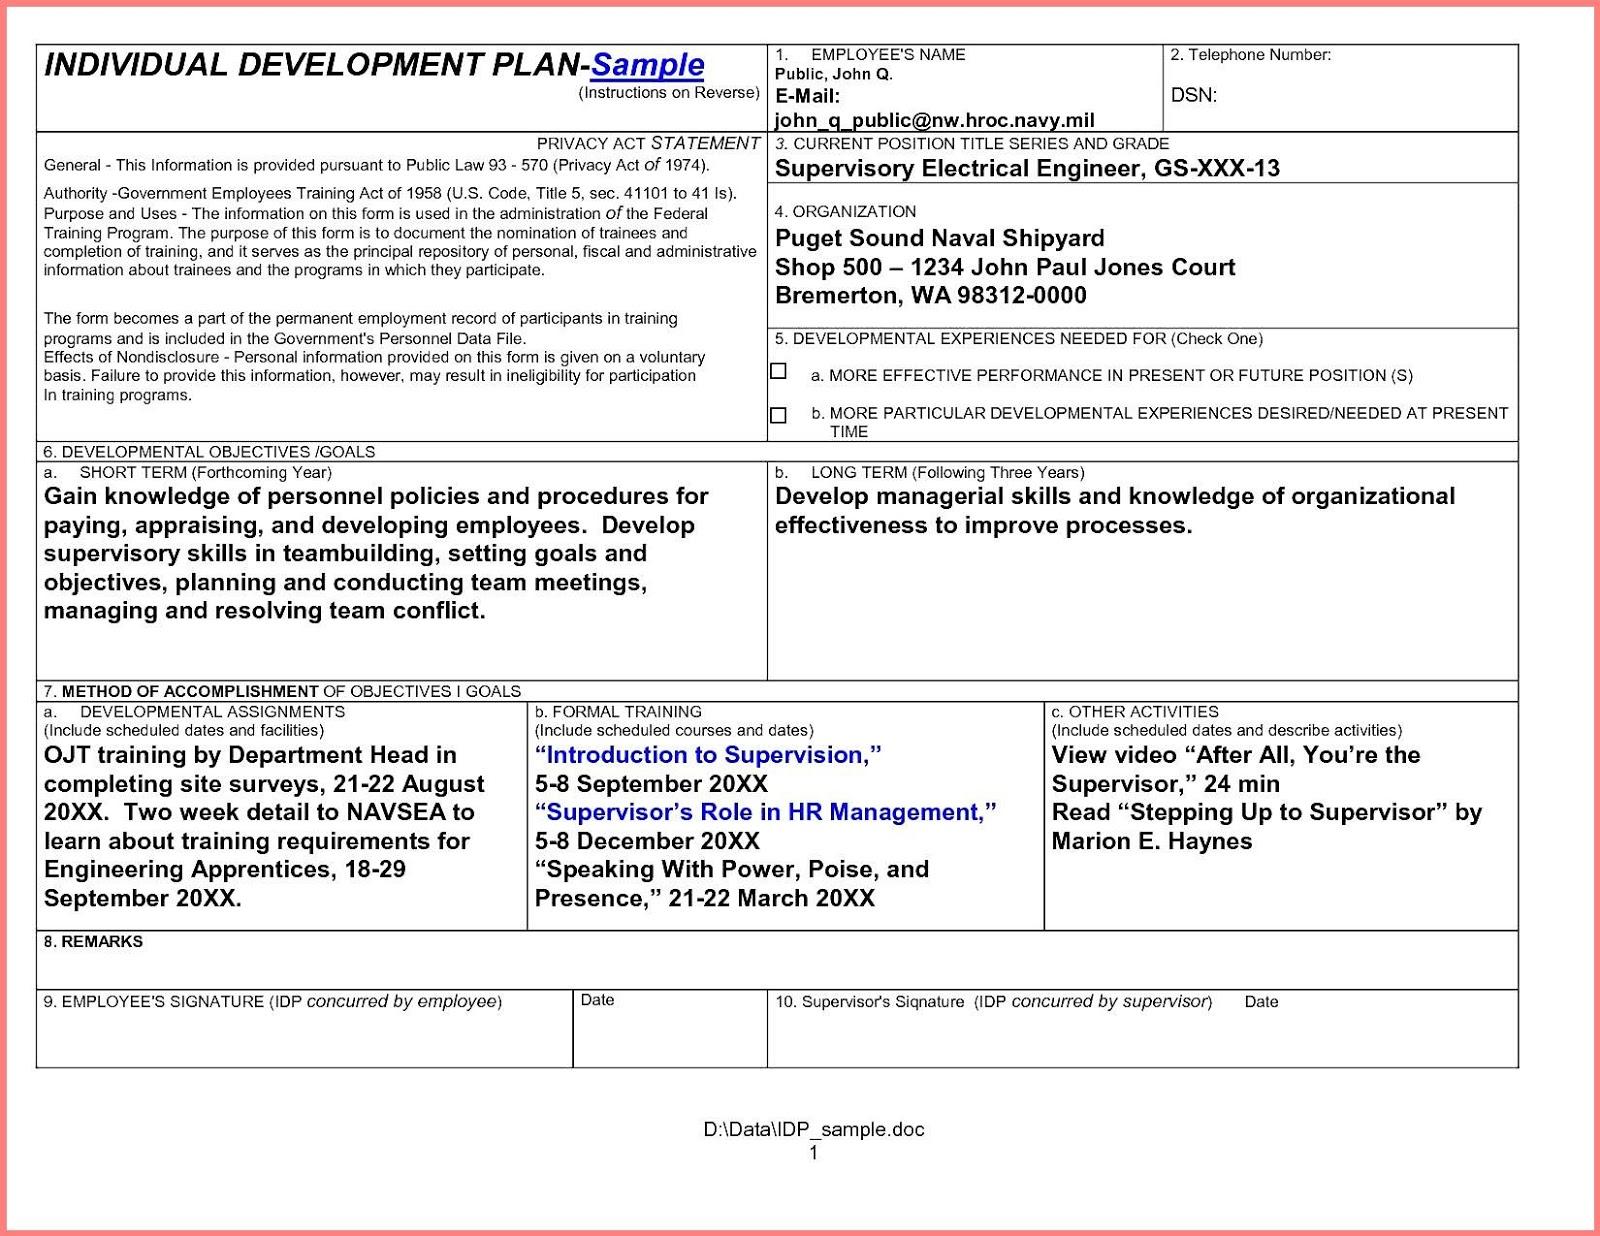 development plan examples - Khafre